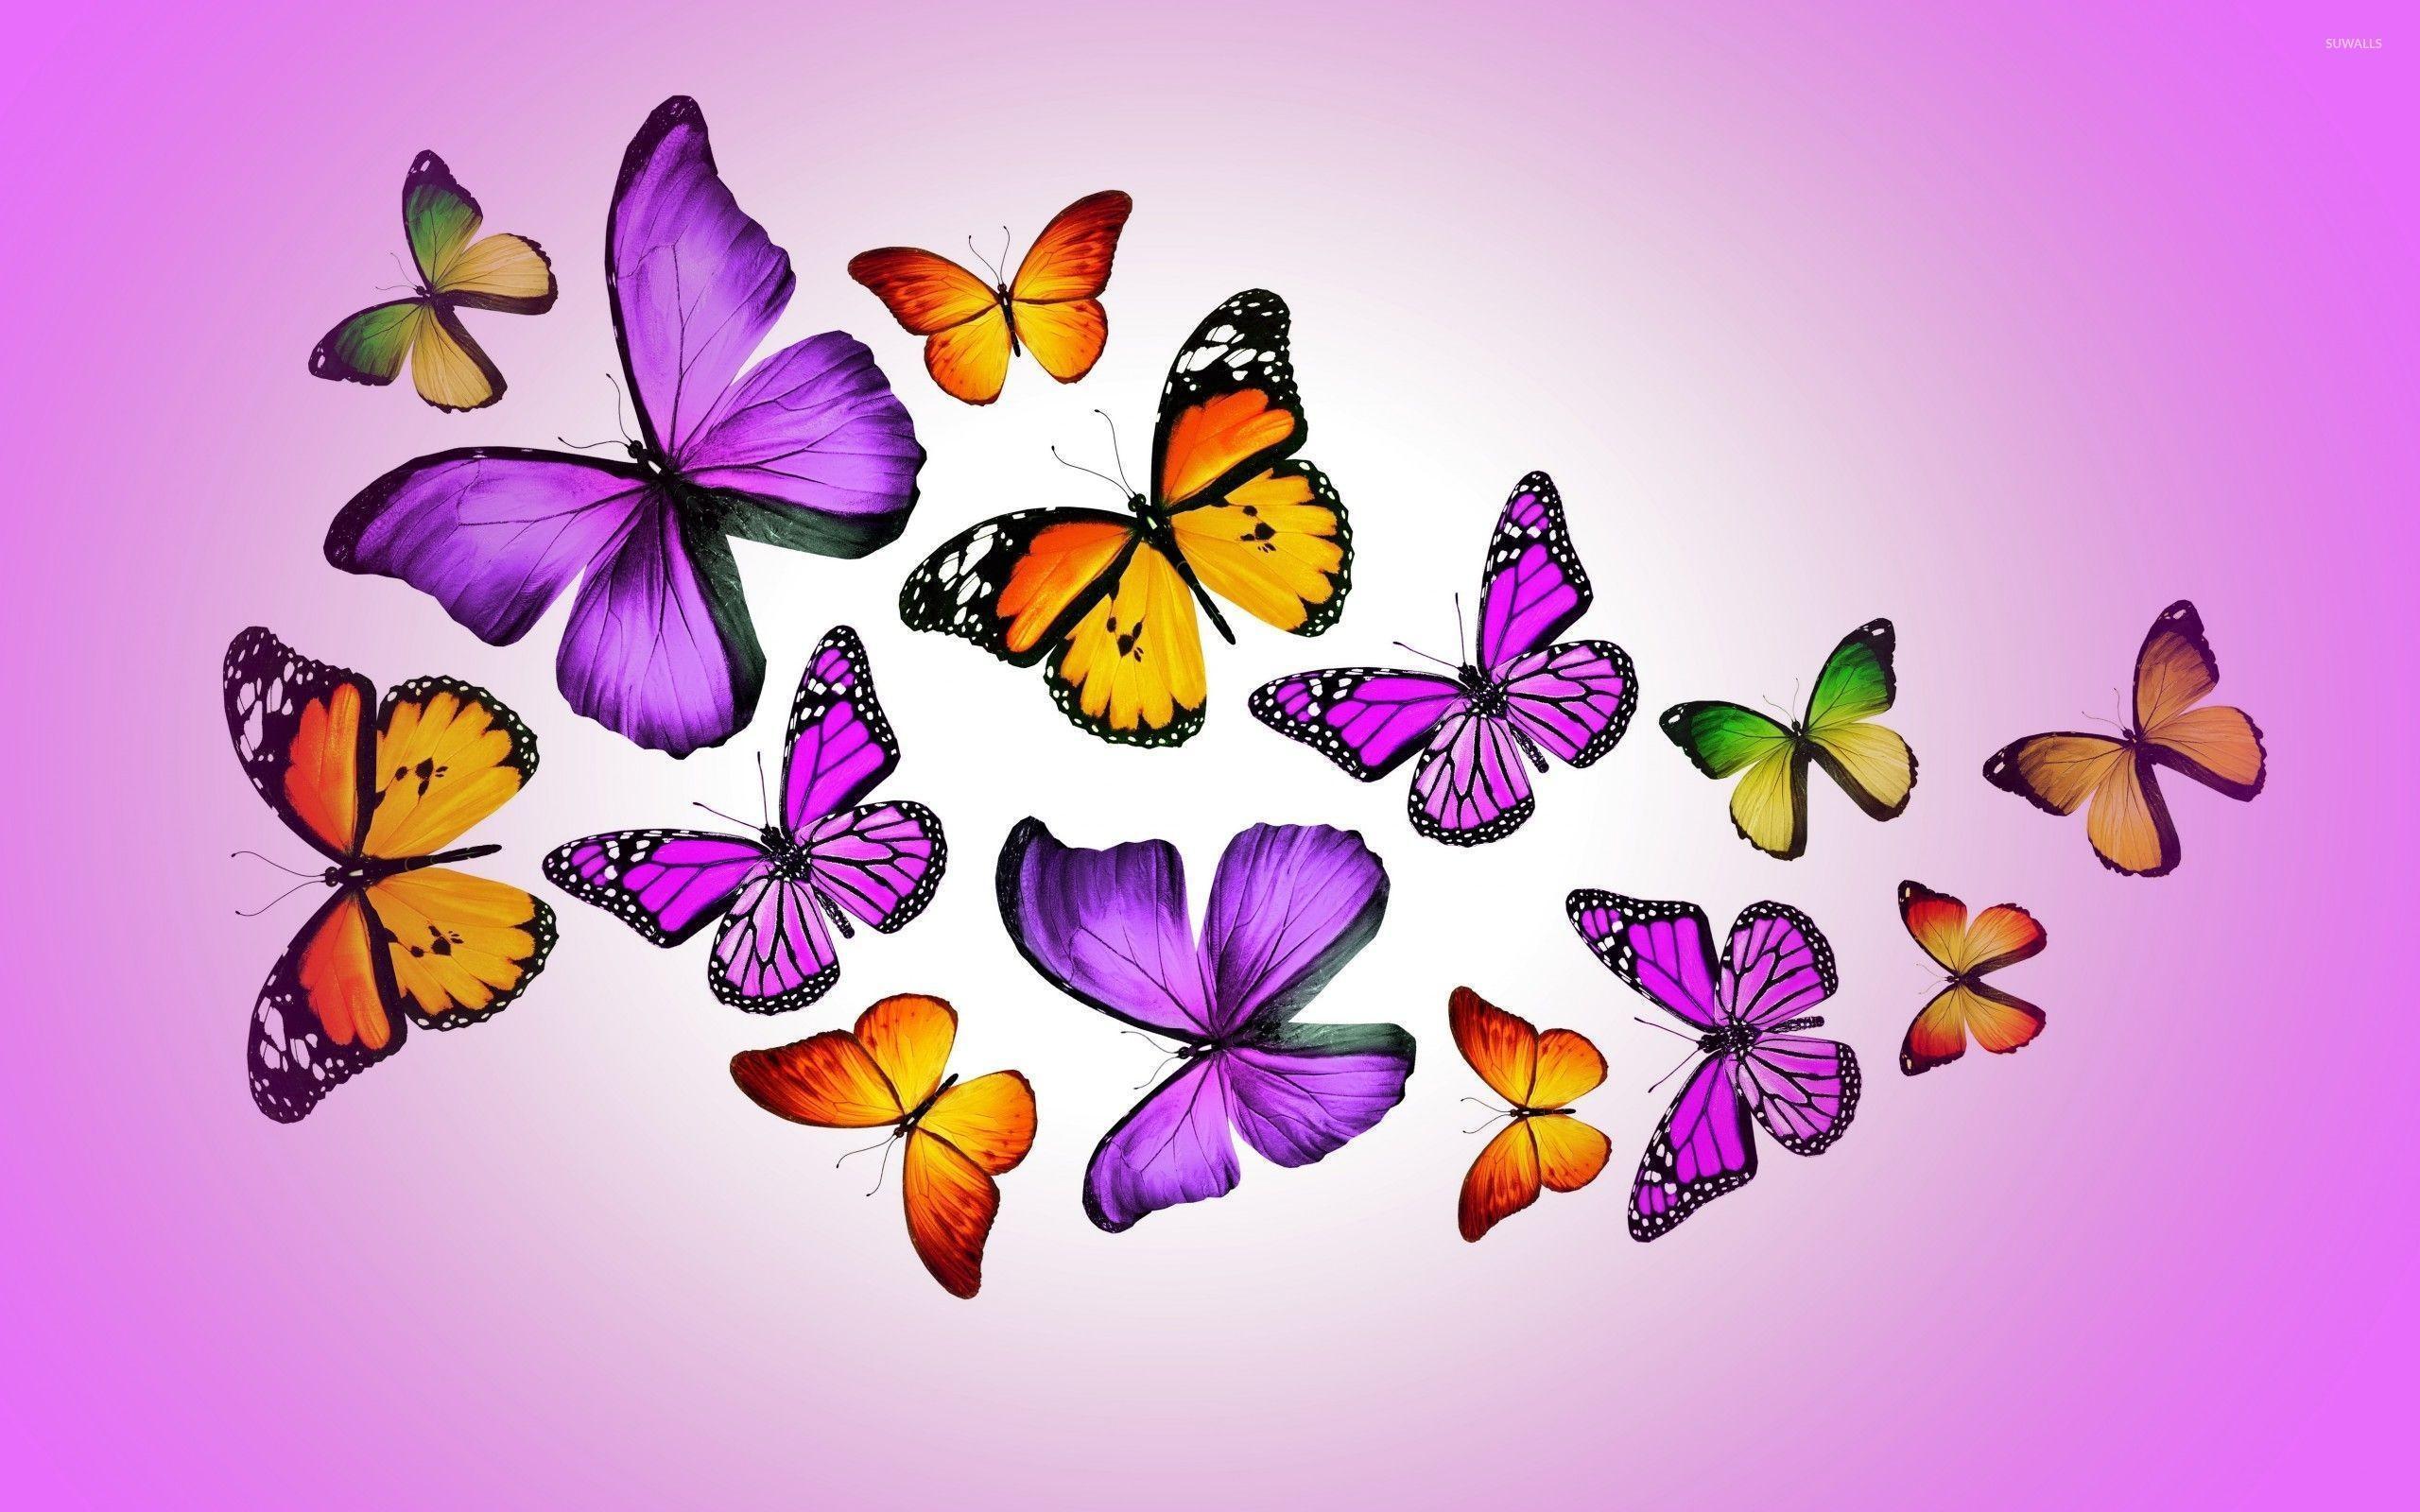 Cartoon Butterfly Wallpapers - Top Free Cartoon Butterfly ...